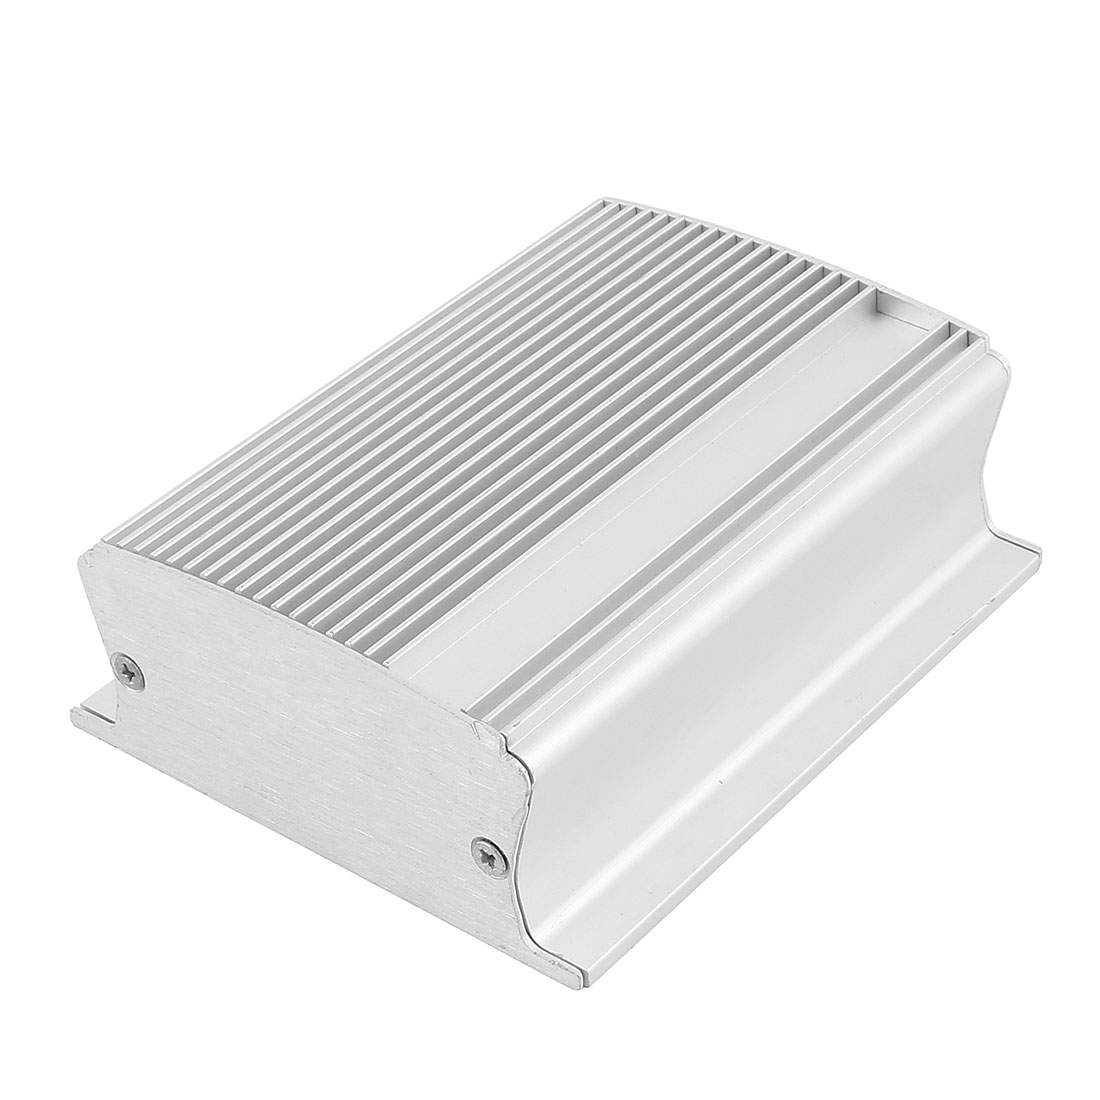 103 x 85 x 36mm Multi-purpose Electronic Extruded Aluminum Enclosure Silver Tone